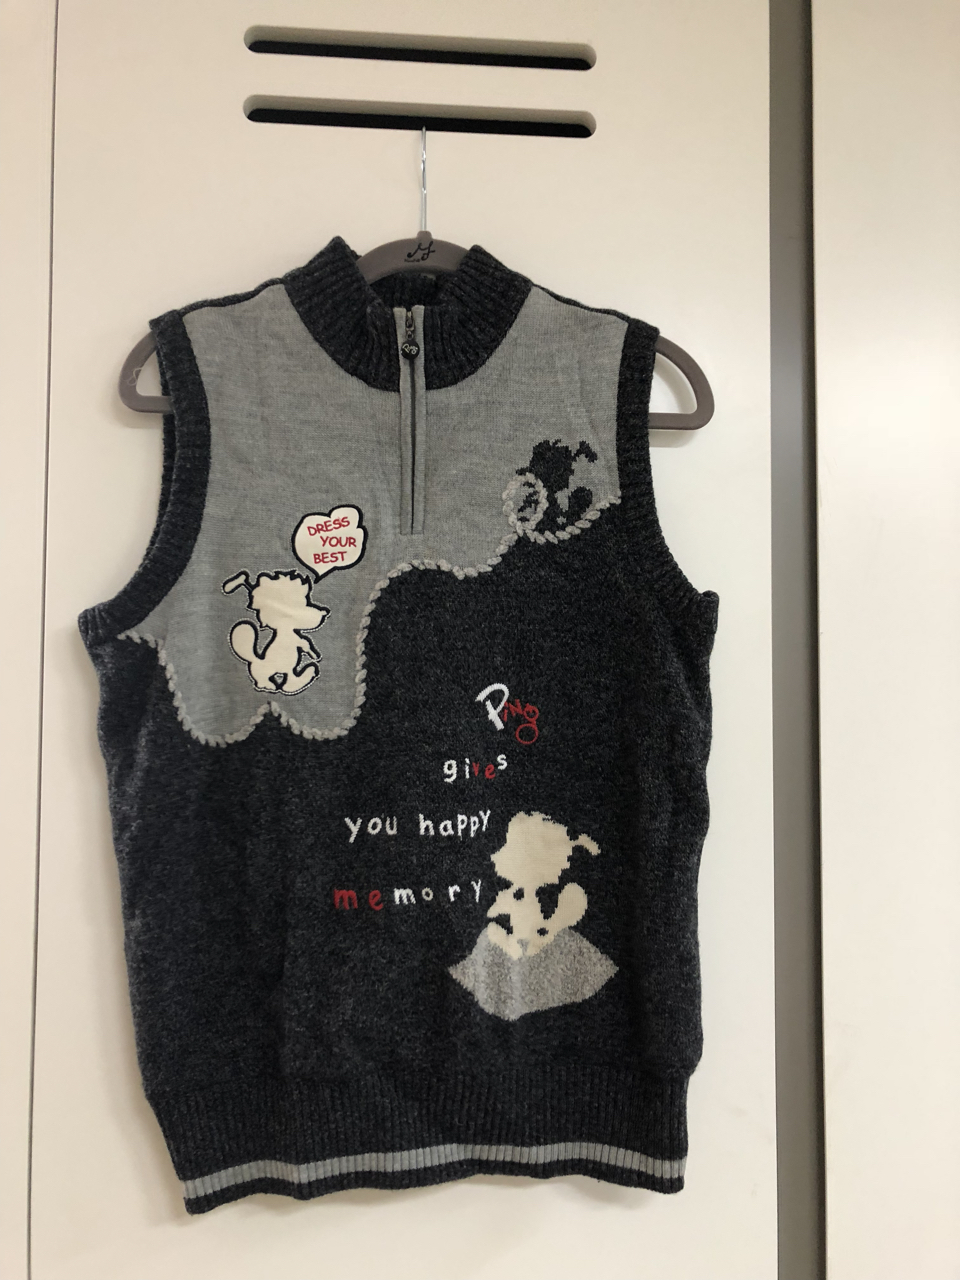 PING 여성 골프옷 상의 조끼 자켓 2pc 세트 95사이즈